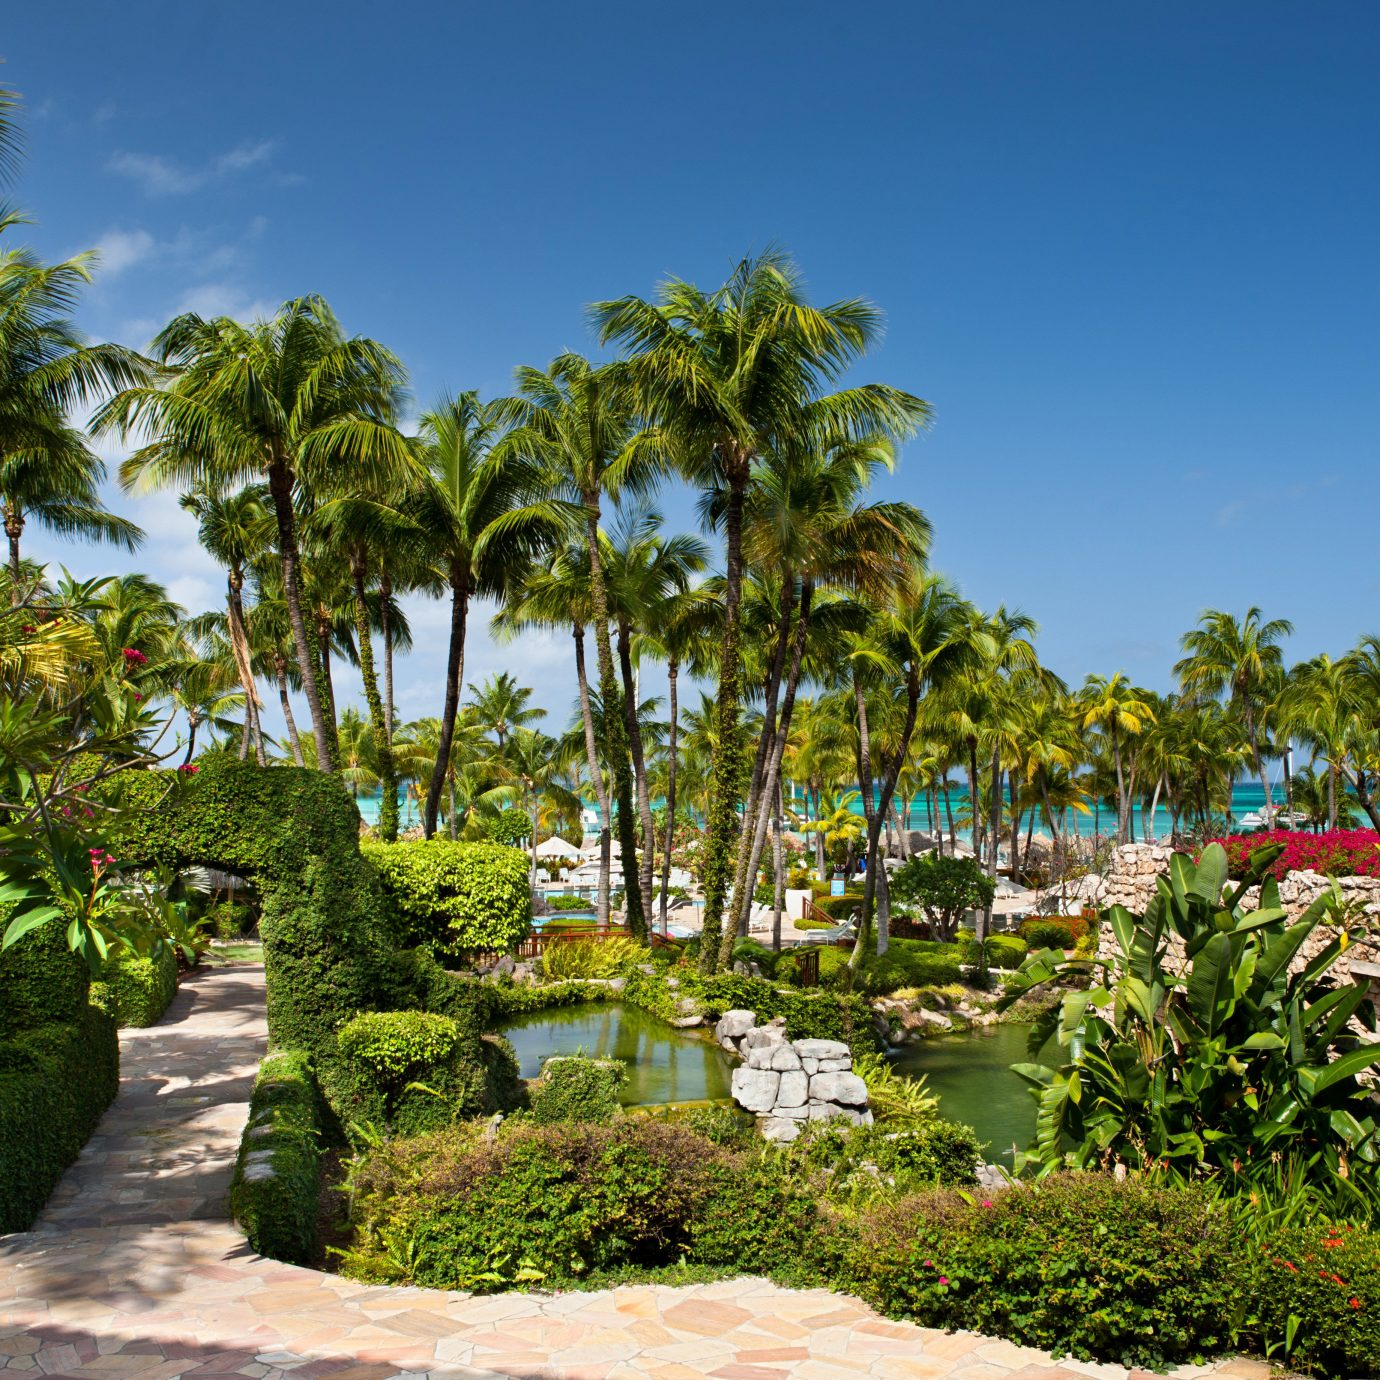 Aruba Beachfront caribbean Casino Classic Grounds Hotels Resort Tropical tree sky flora ecosystem botany plant Garden arecales flower tropics palm palm family botanical garden park Jungle lined